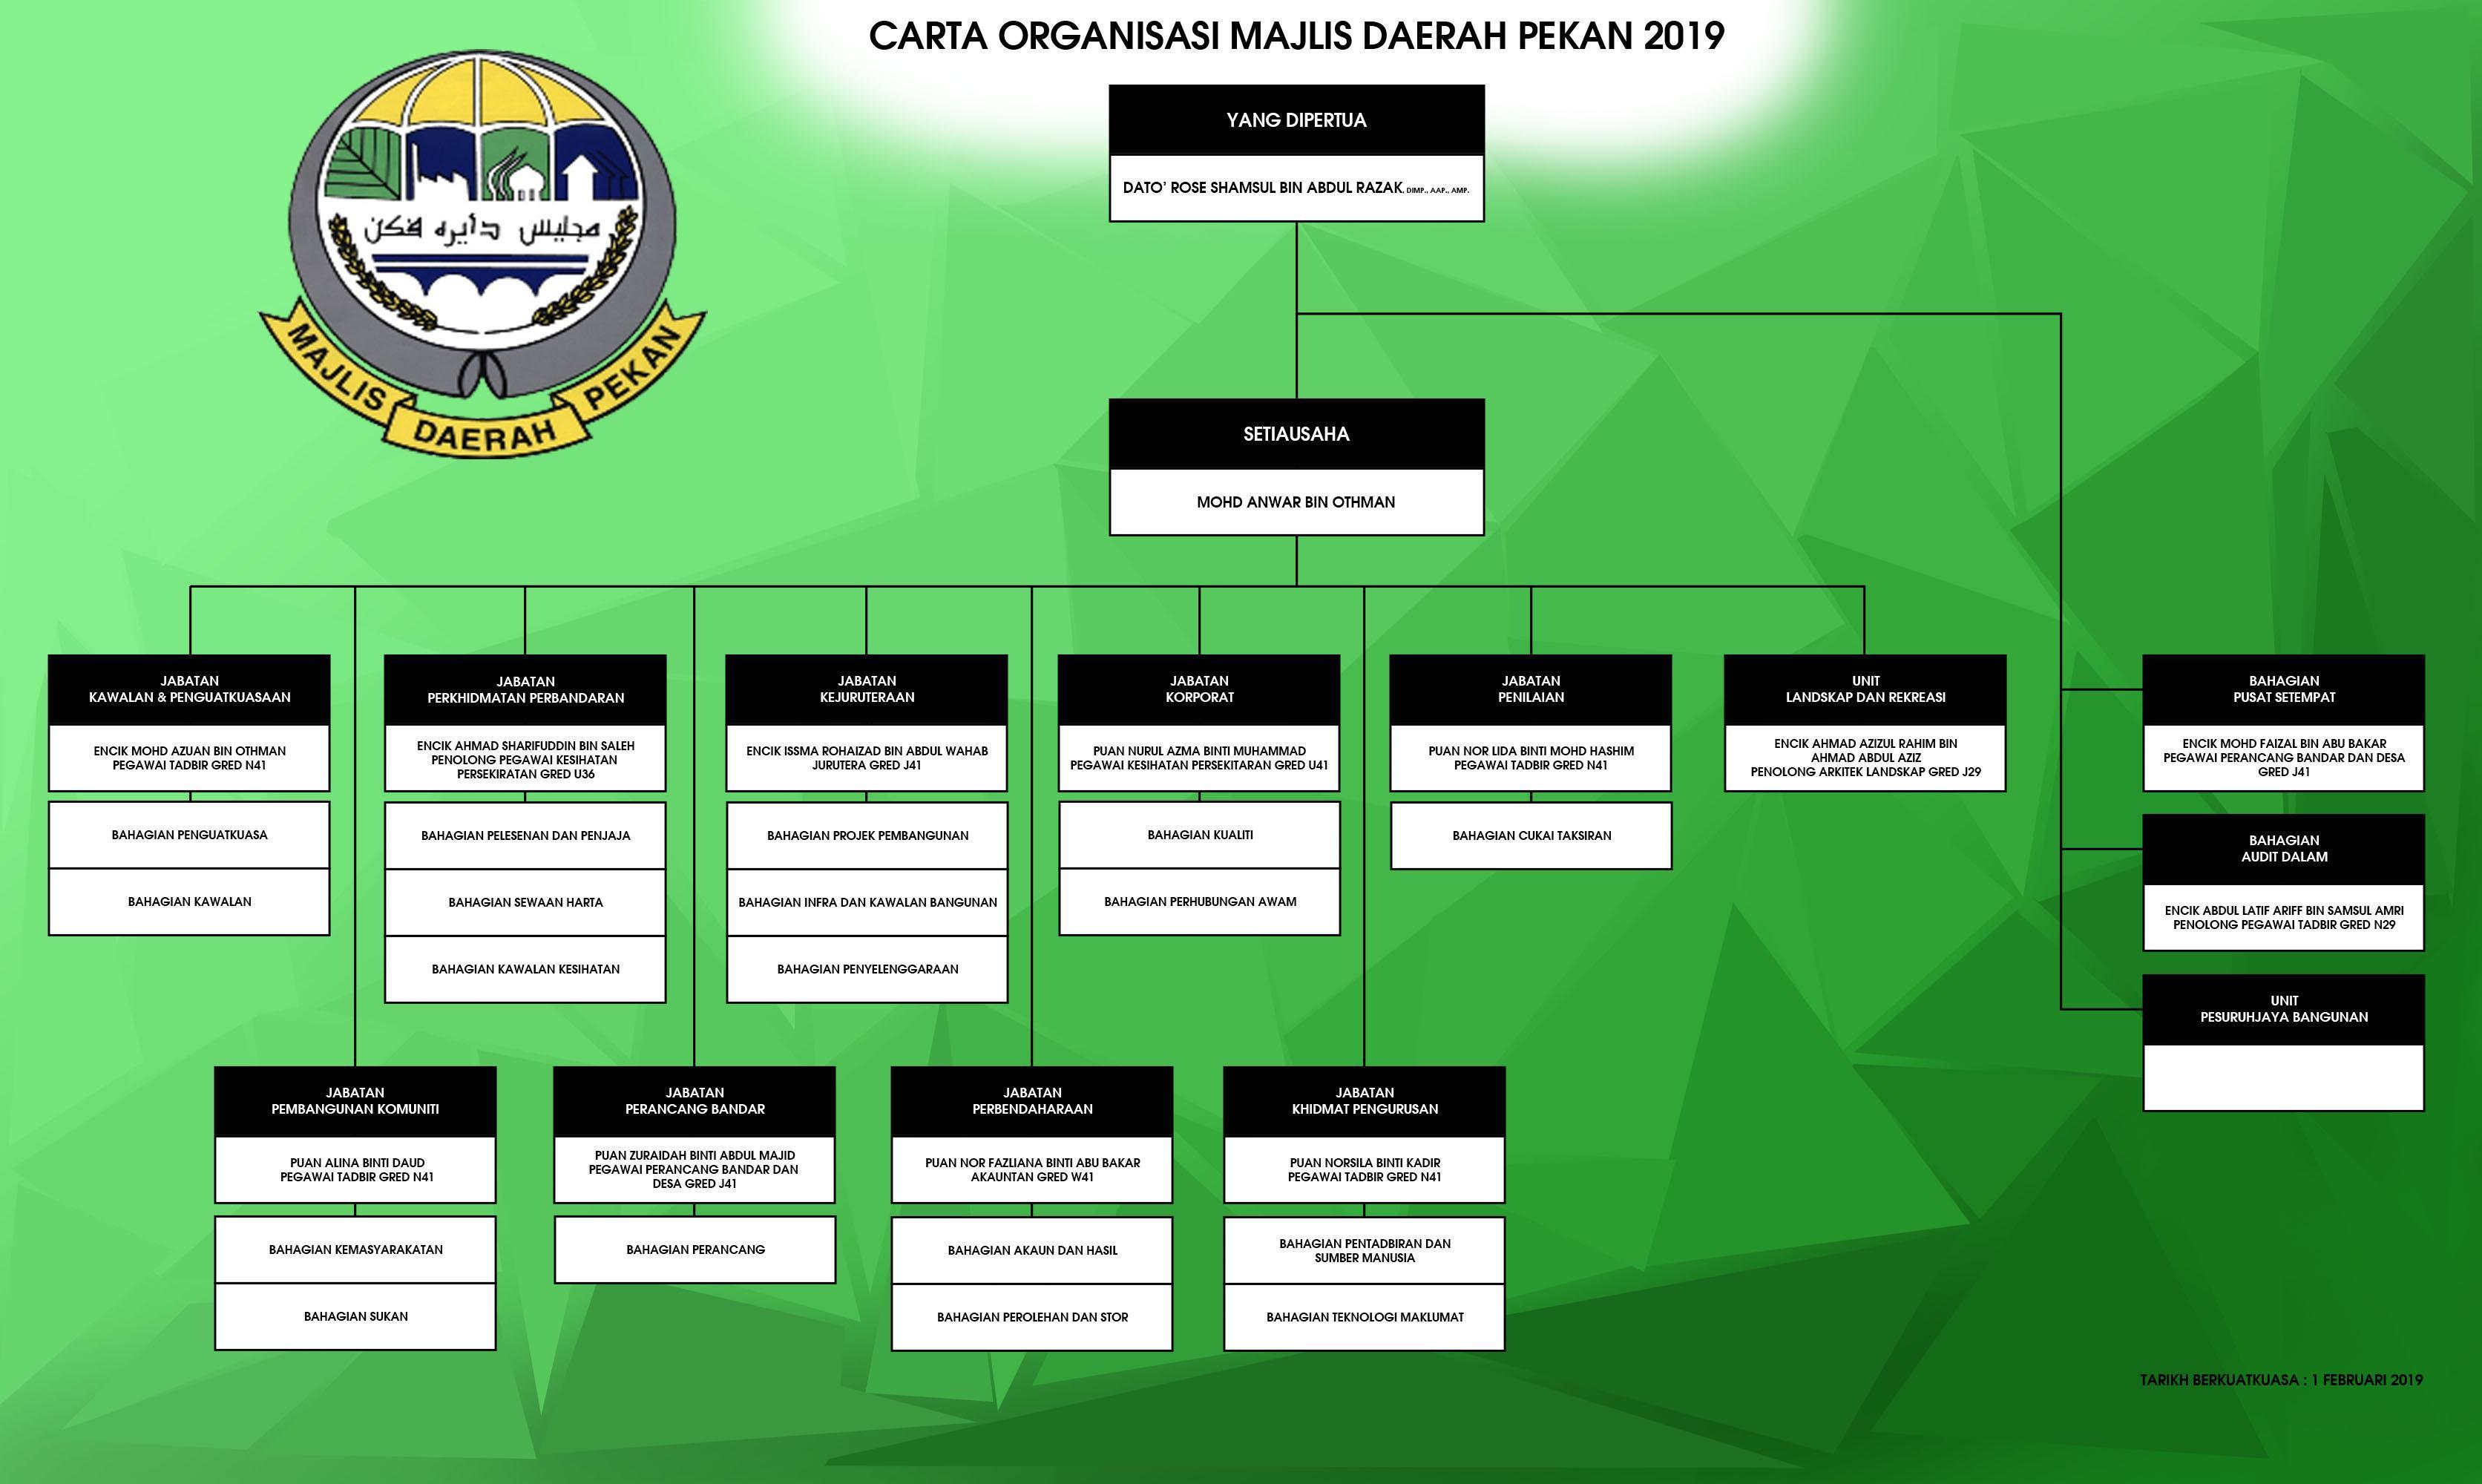 carta organisasi MDP